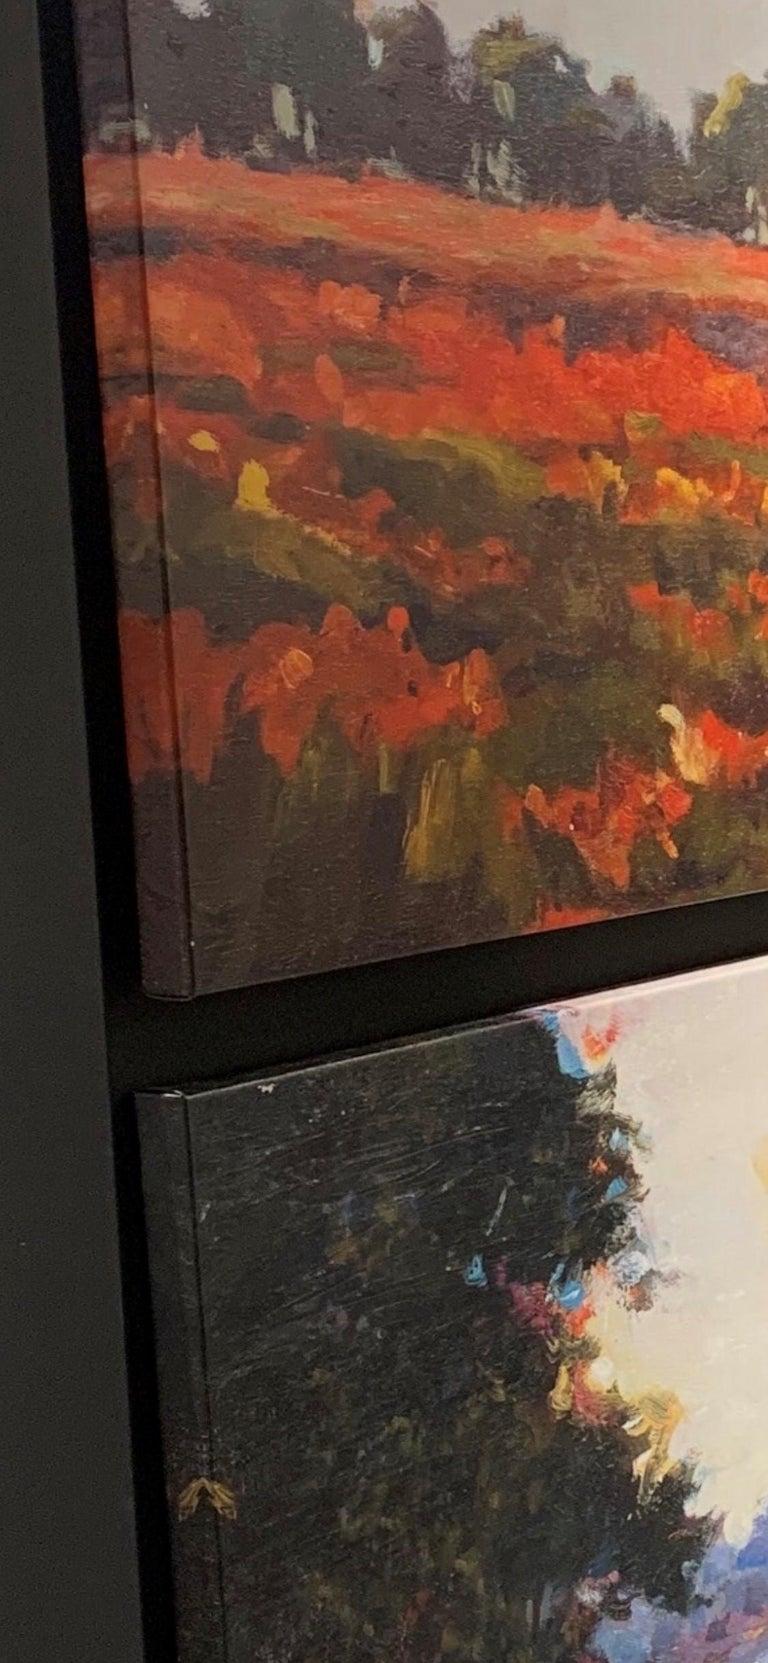 VIVERE by John Beard. Original Artwork, Hand Painted, & American Living Artist For Sale 2